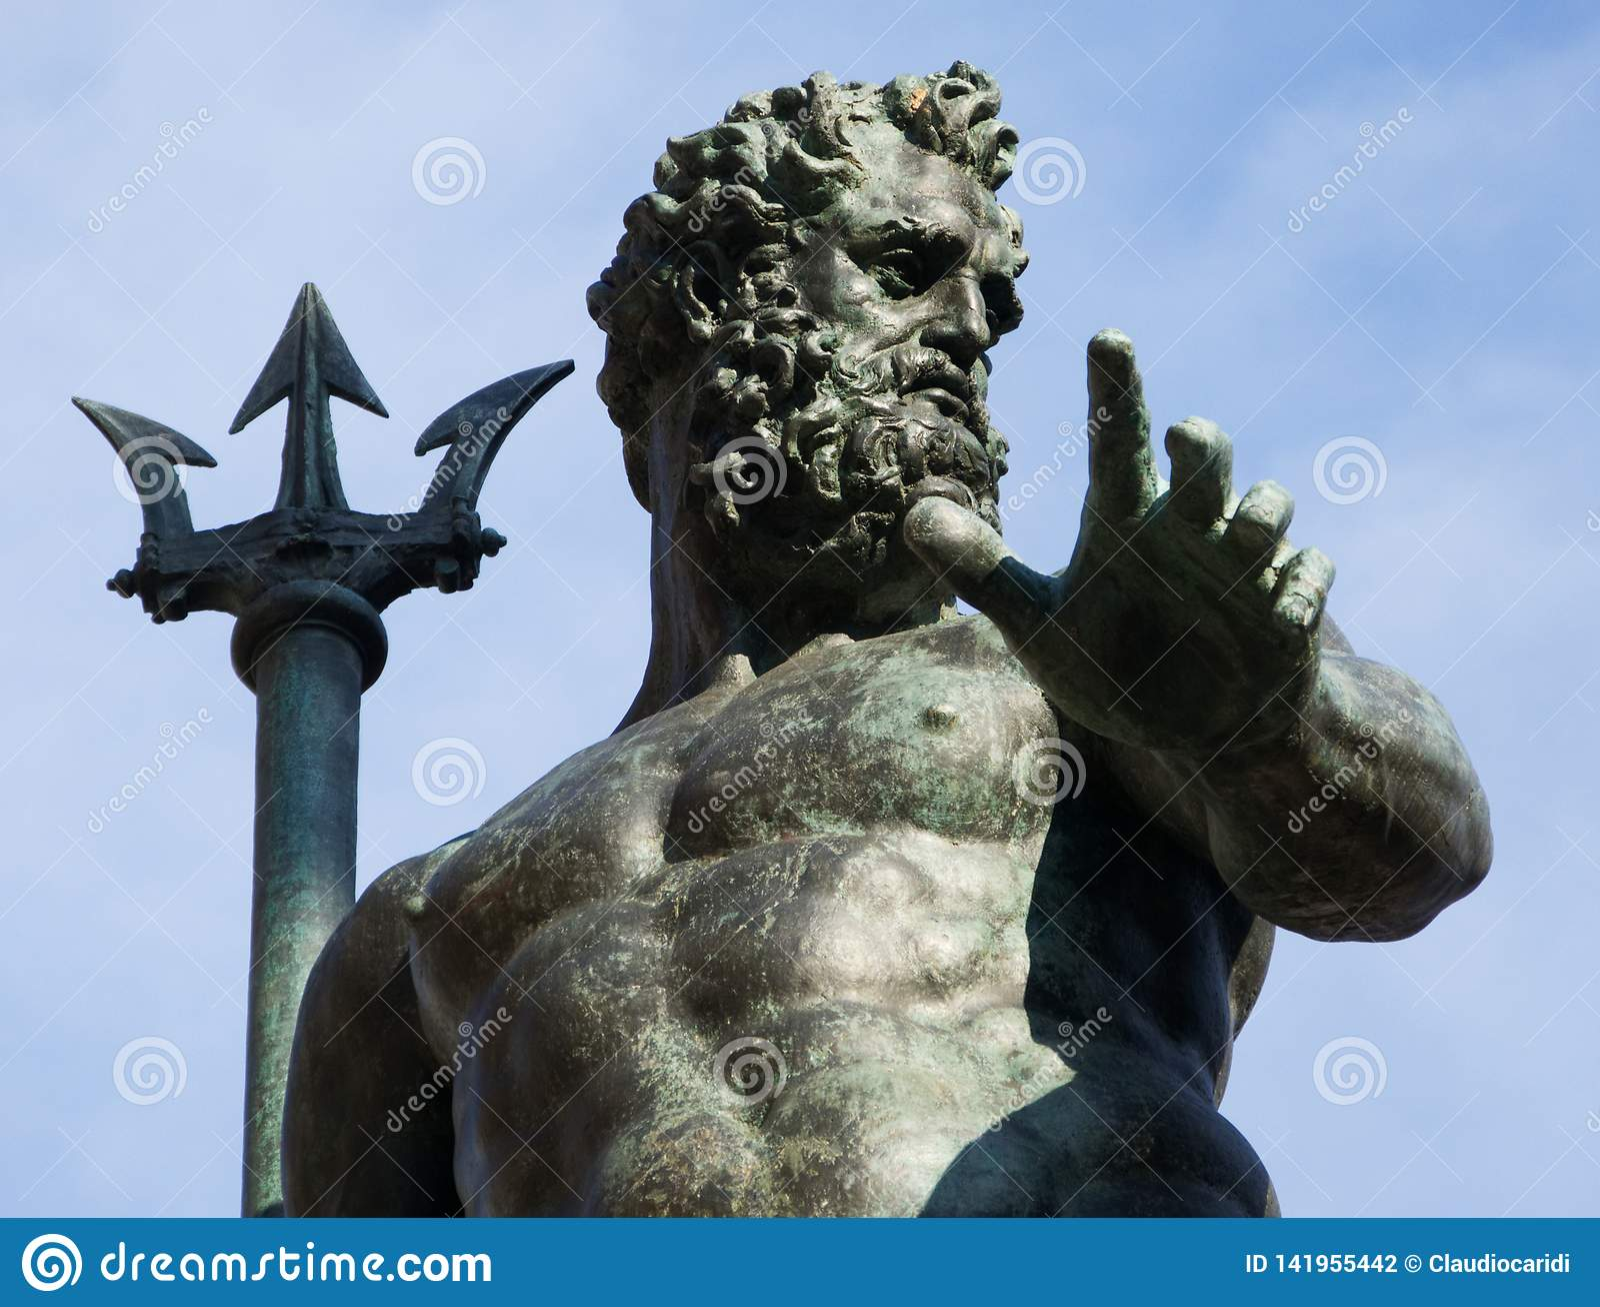 Fountain of Neptune, Fontana del Nettuno, Bologna, Italy